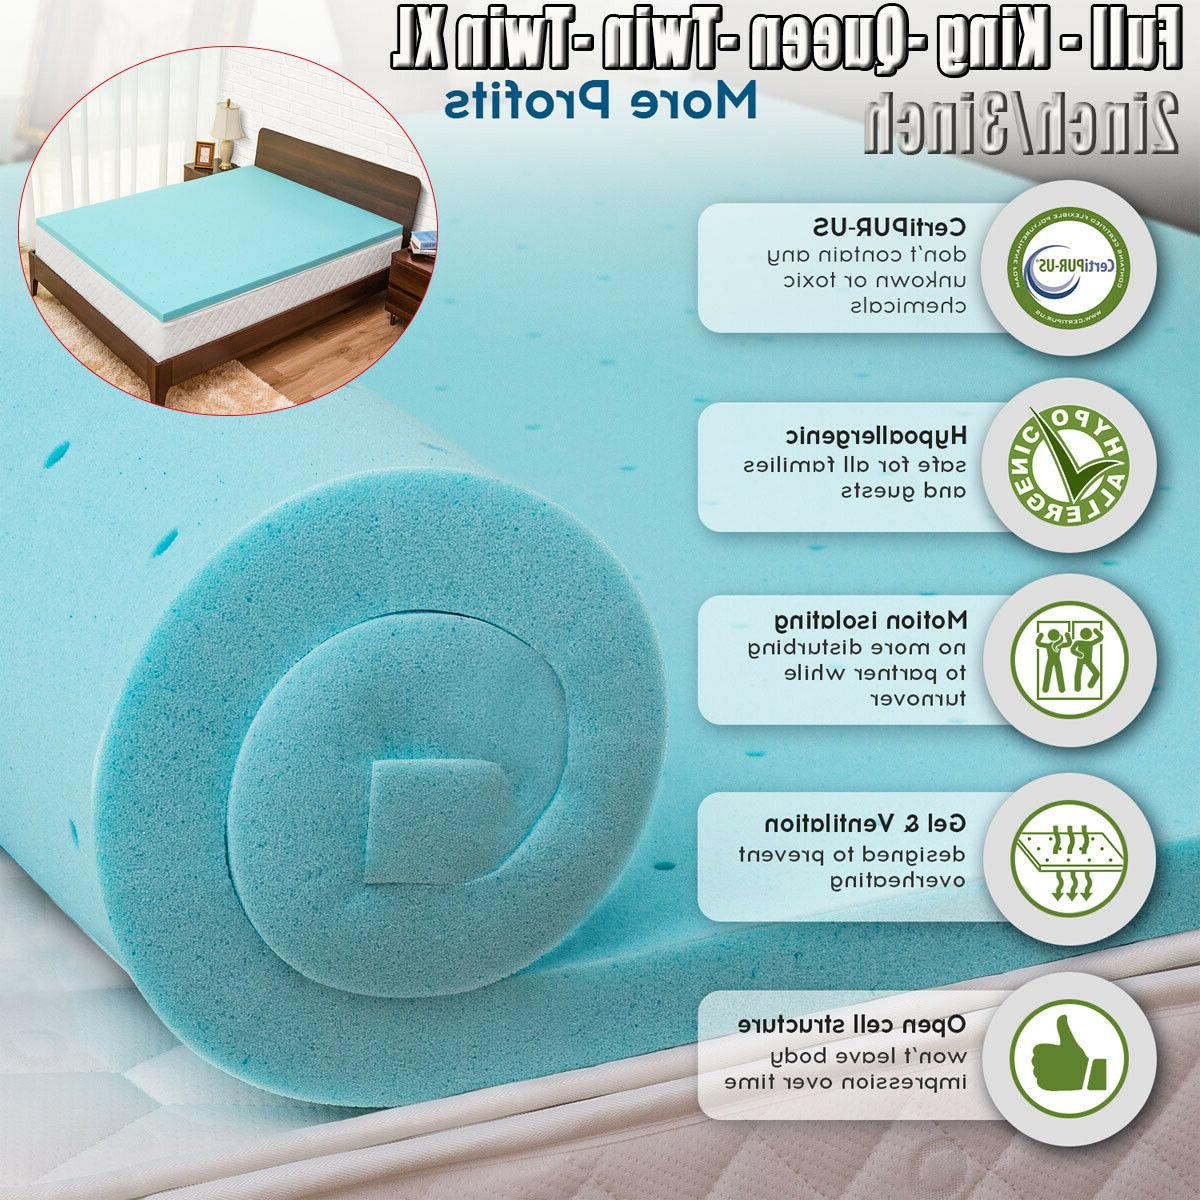 Cooling Gel Memory Foam Bed Mattress Pad Cover Topper Queen